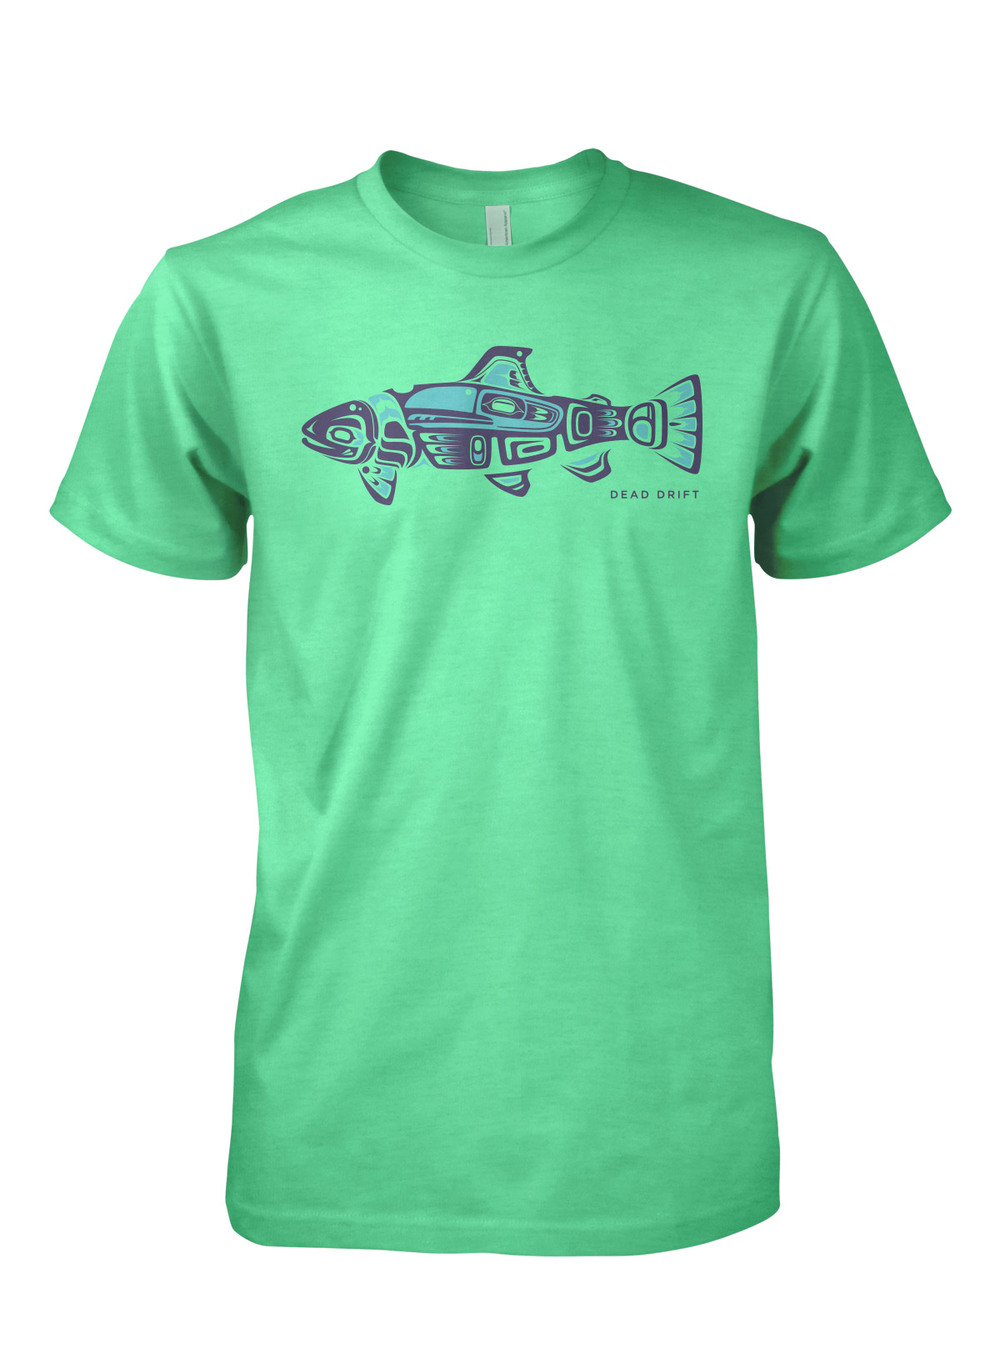 Dead drift fly pnw trout dead drift for Fishing logo t shirts